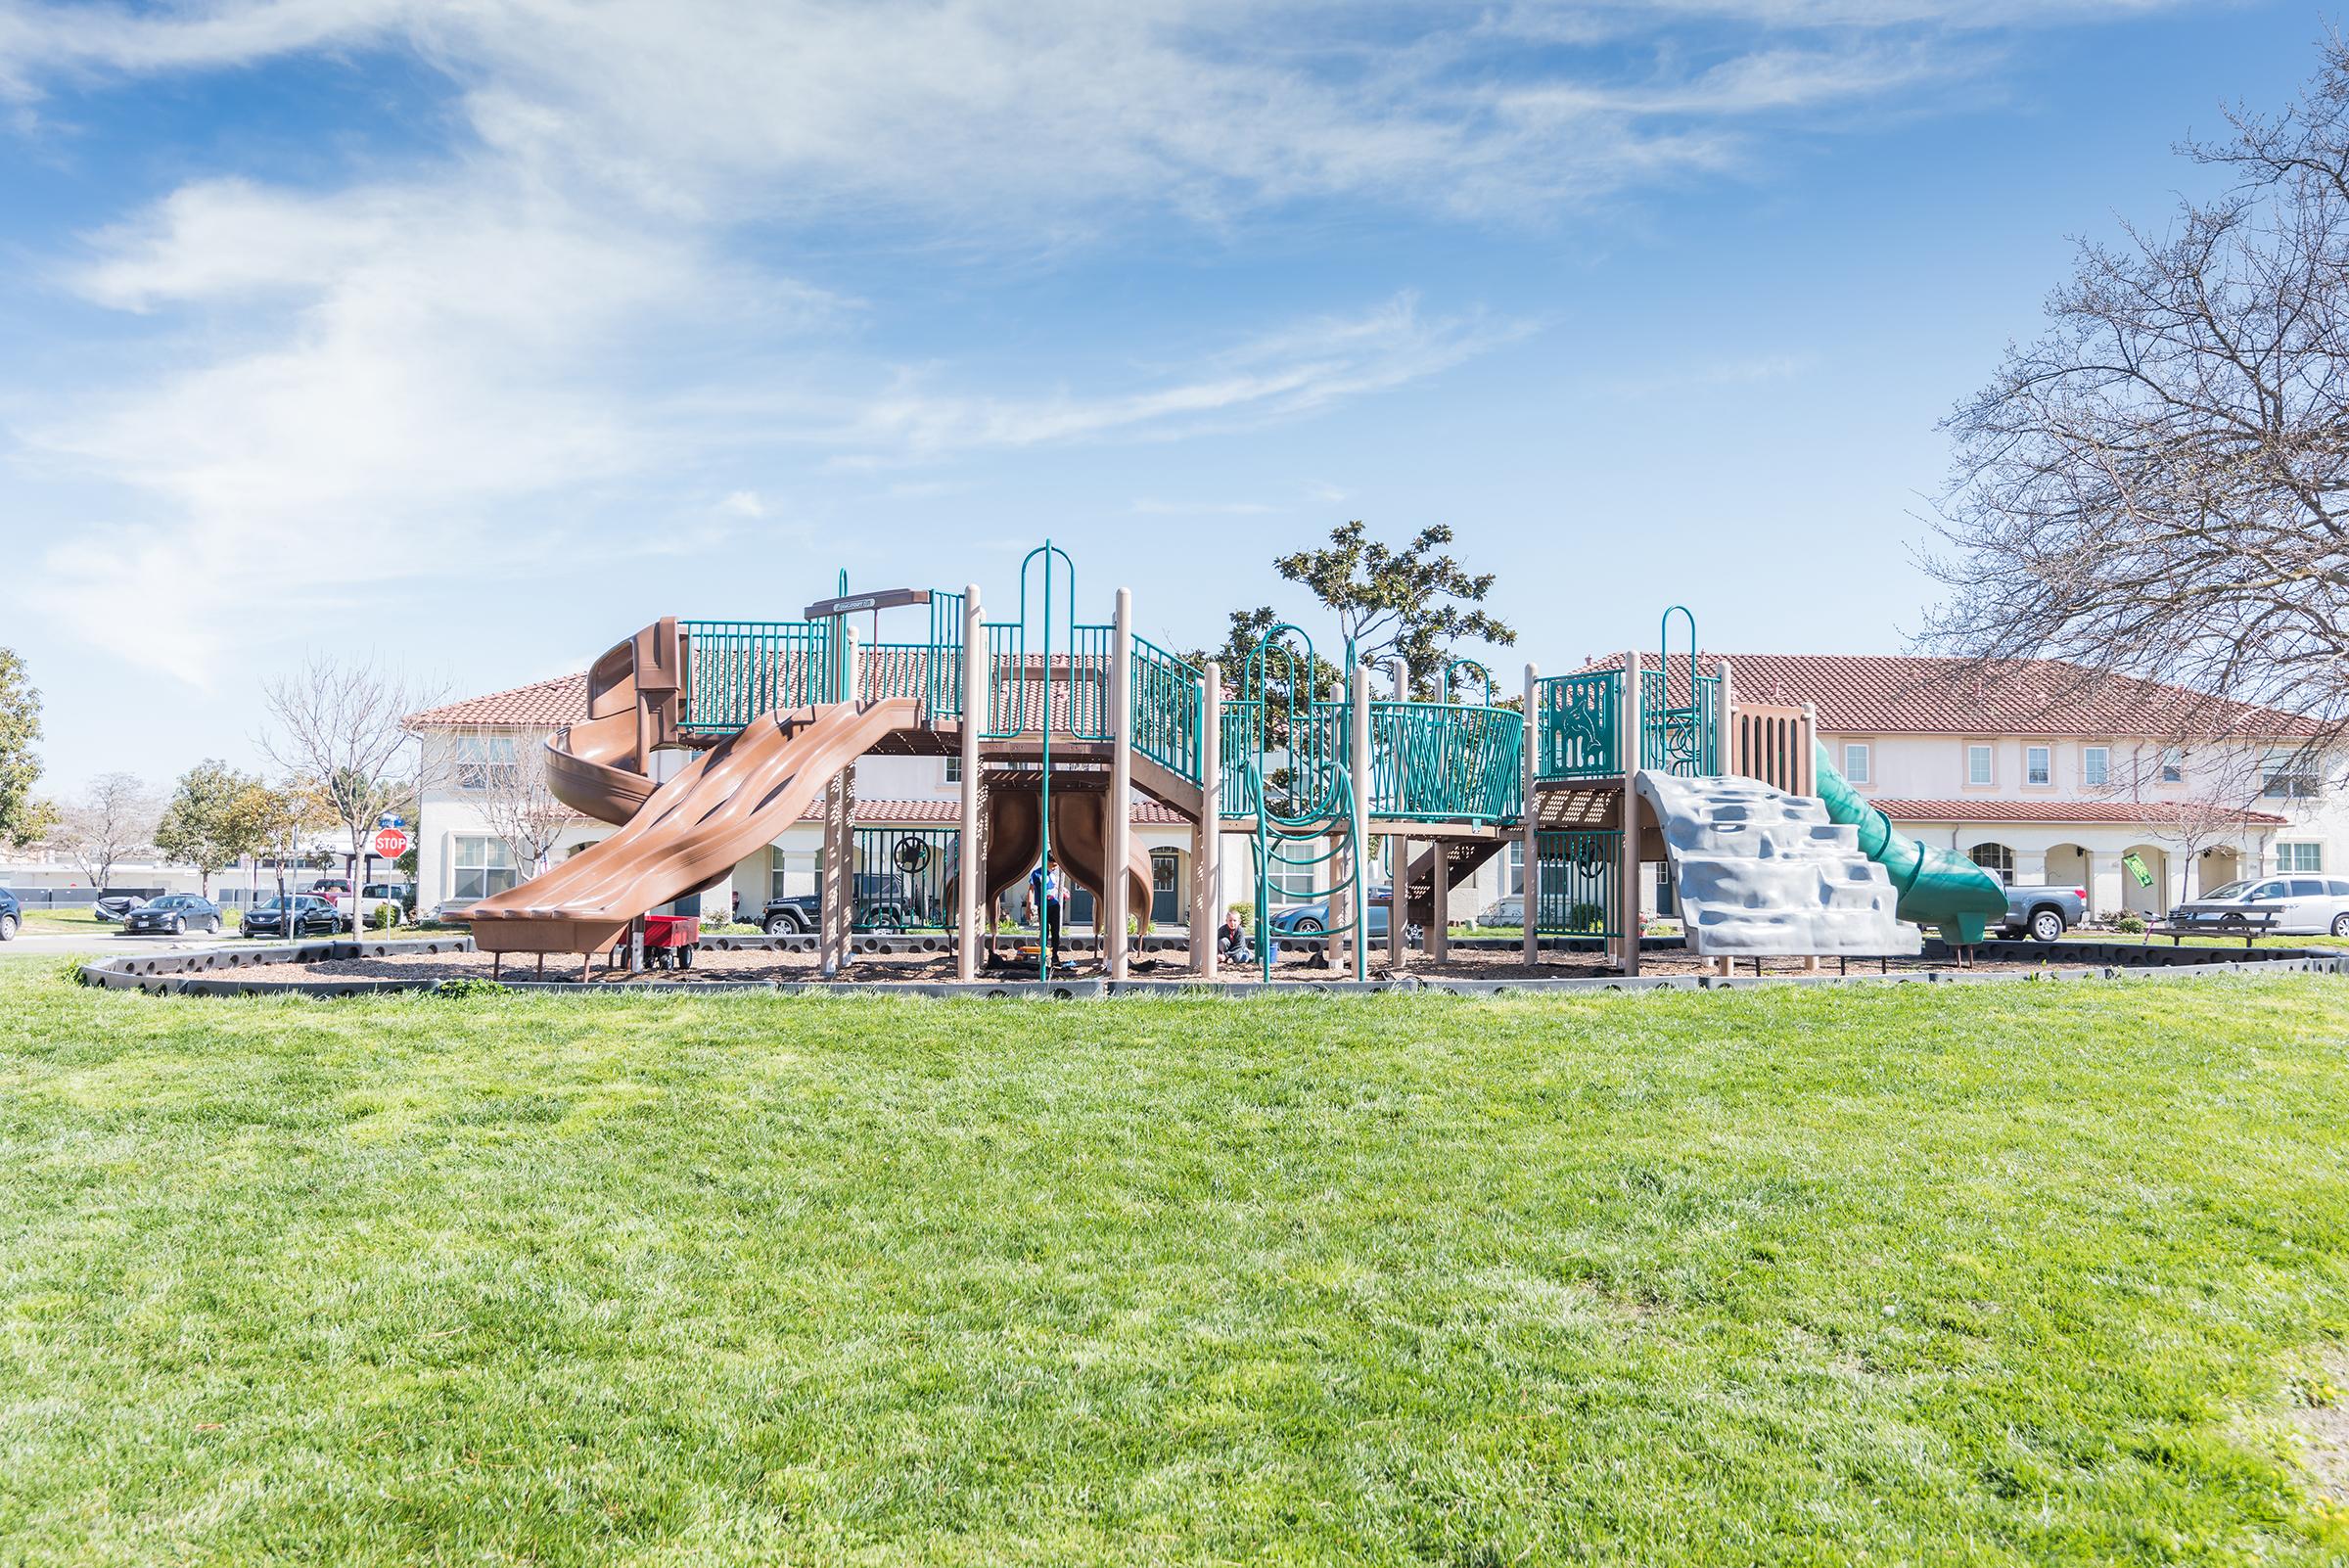 Community Playground at Wescoat Village